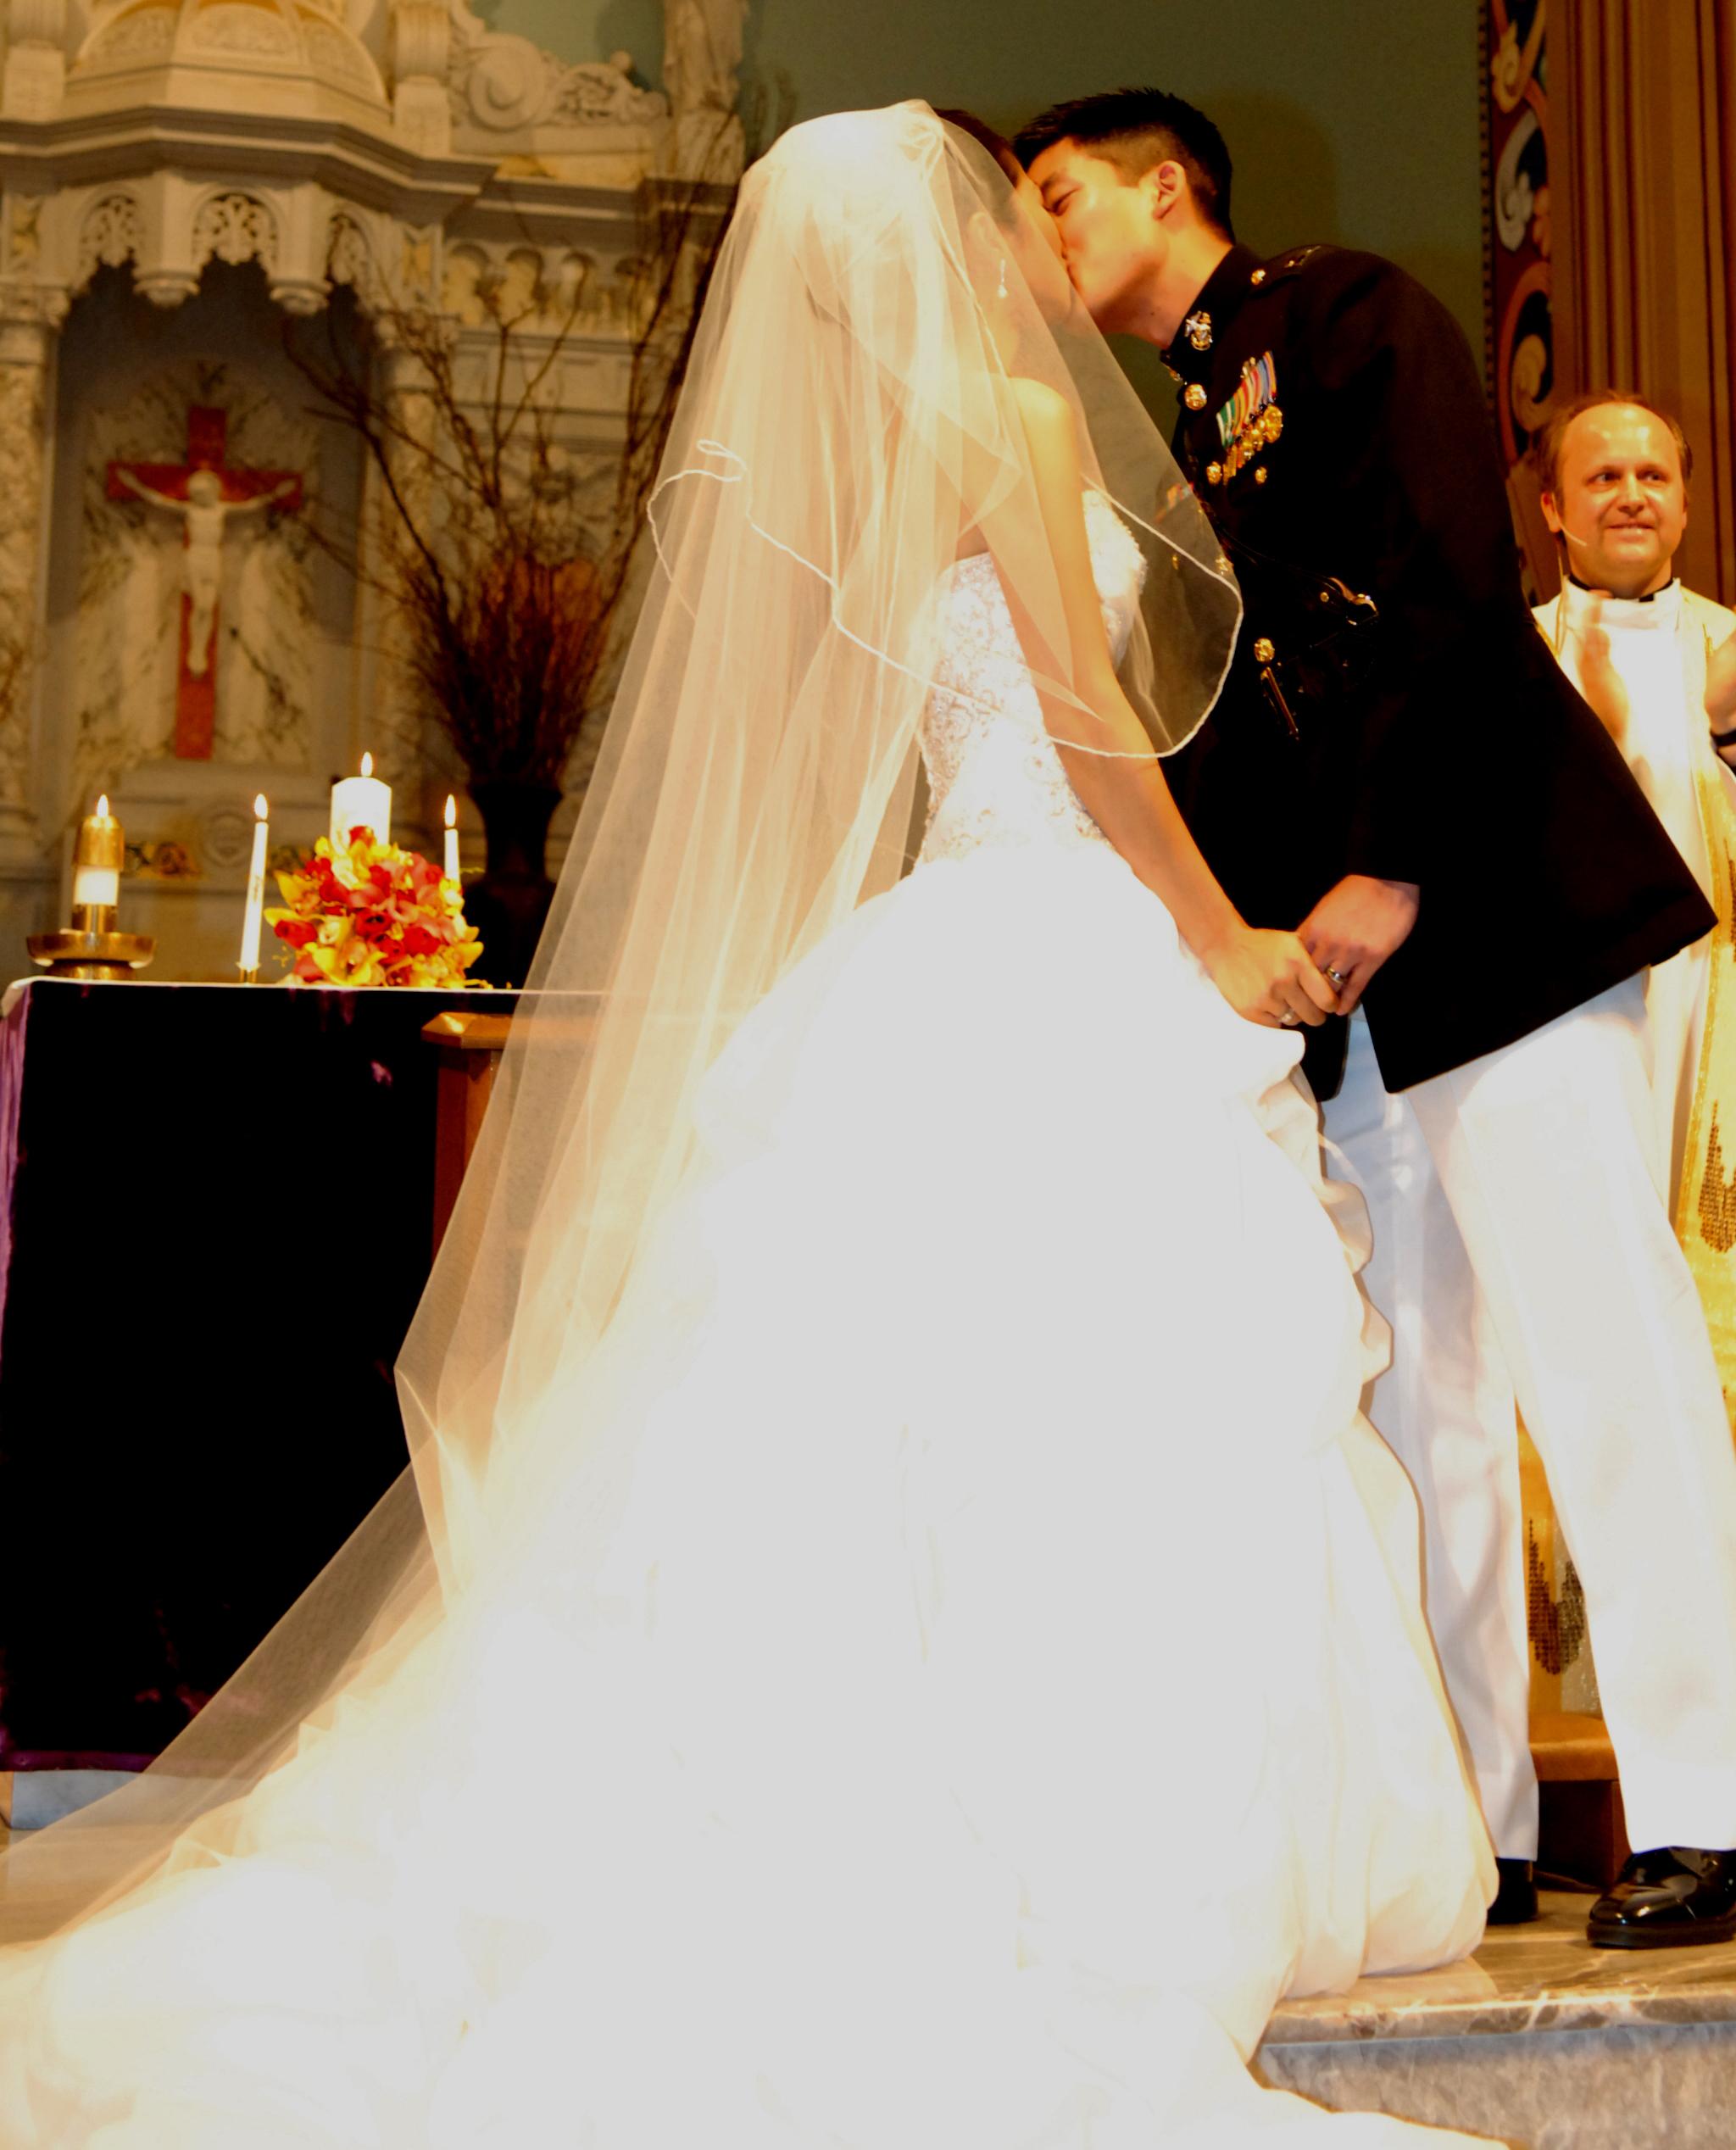 Ceremony, Flowers & Decor, Wedding Dresses, Veils, Fashion, ivory, dress, Veil, Train, Strapless, Strapless Wedding Dresses